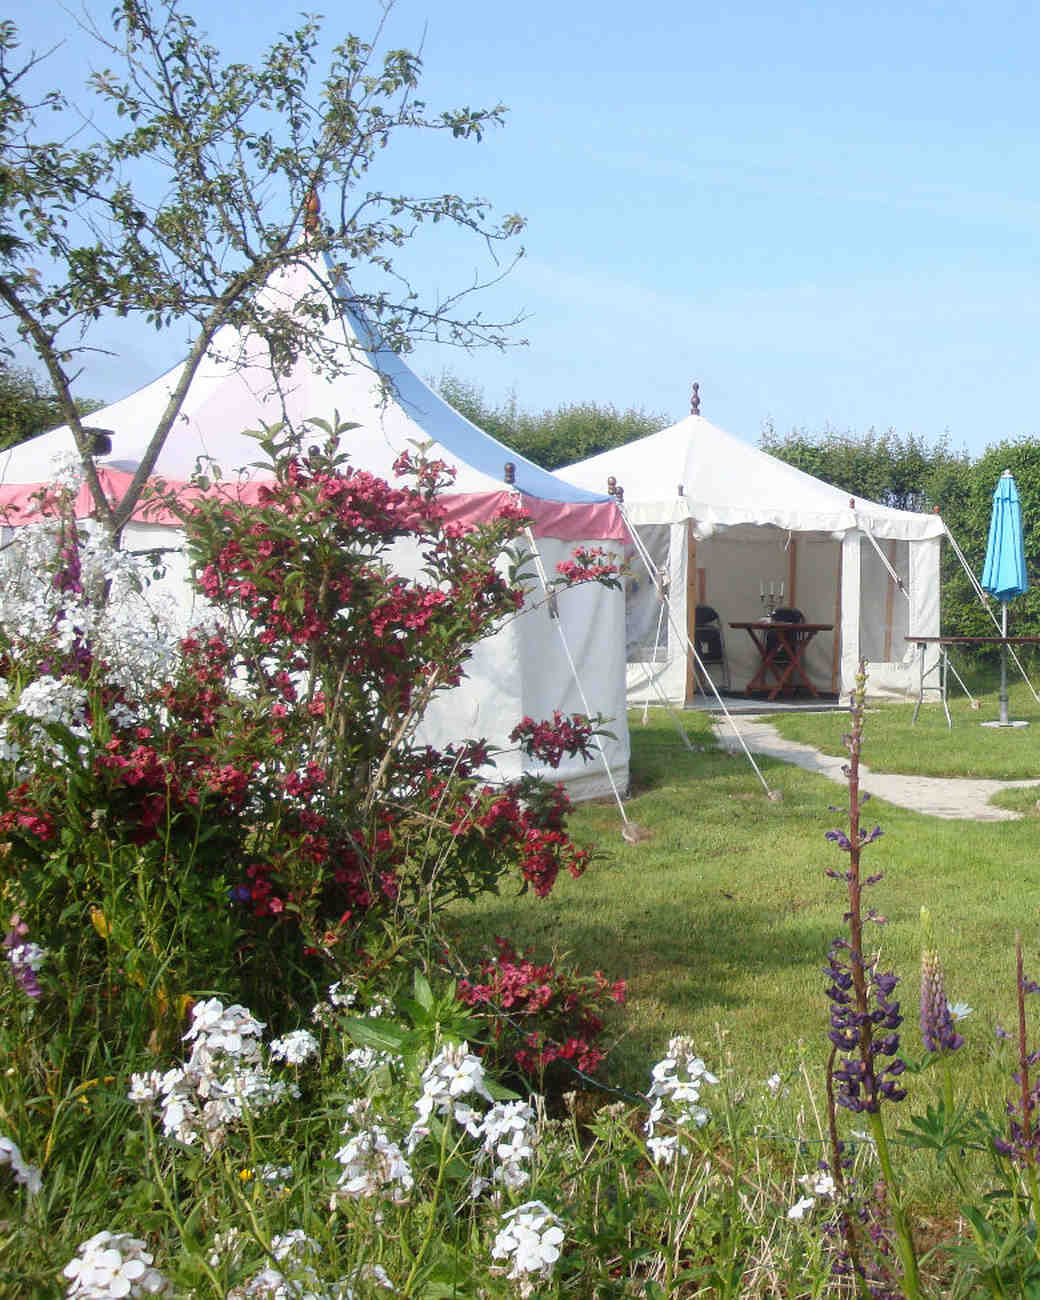 airbnb-wedding-venues-davidstow-united-kingdom-0515.jpg